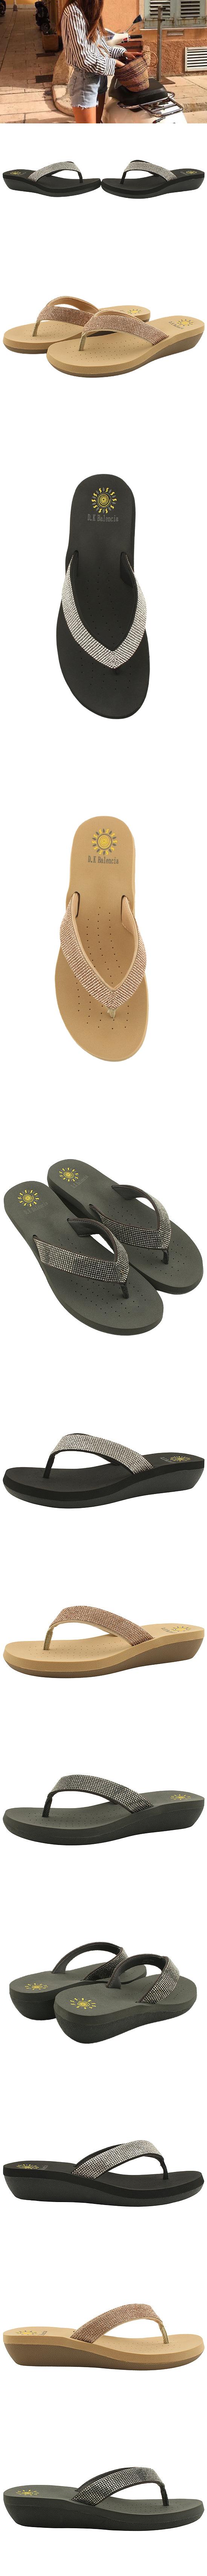 Soft Cushioning Flip-Flop Slippers Black